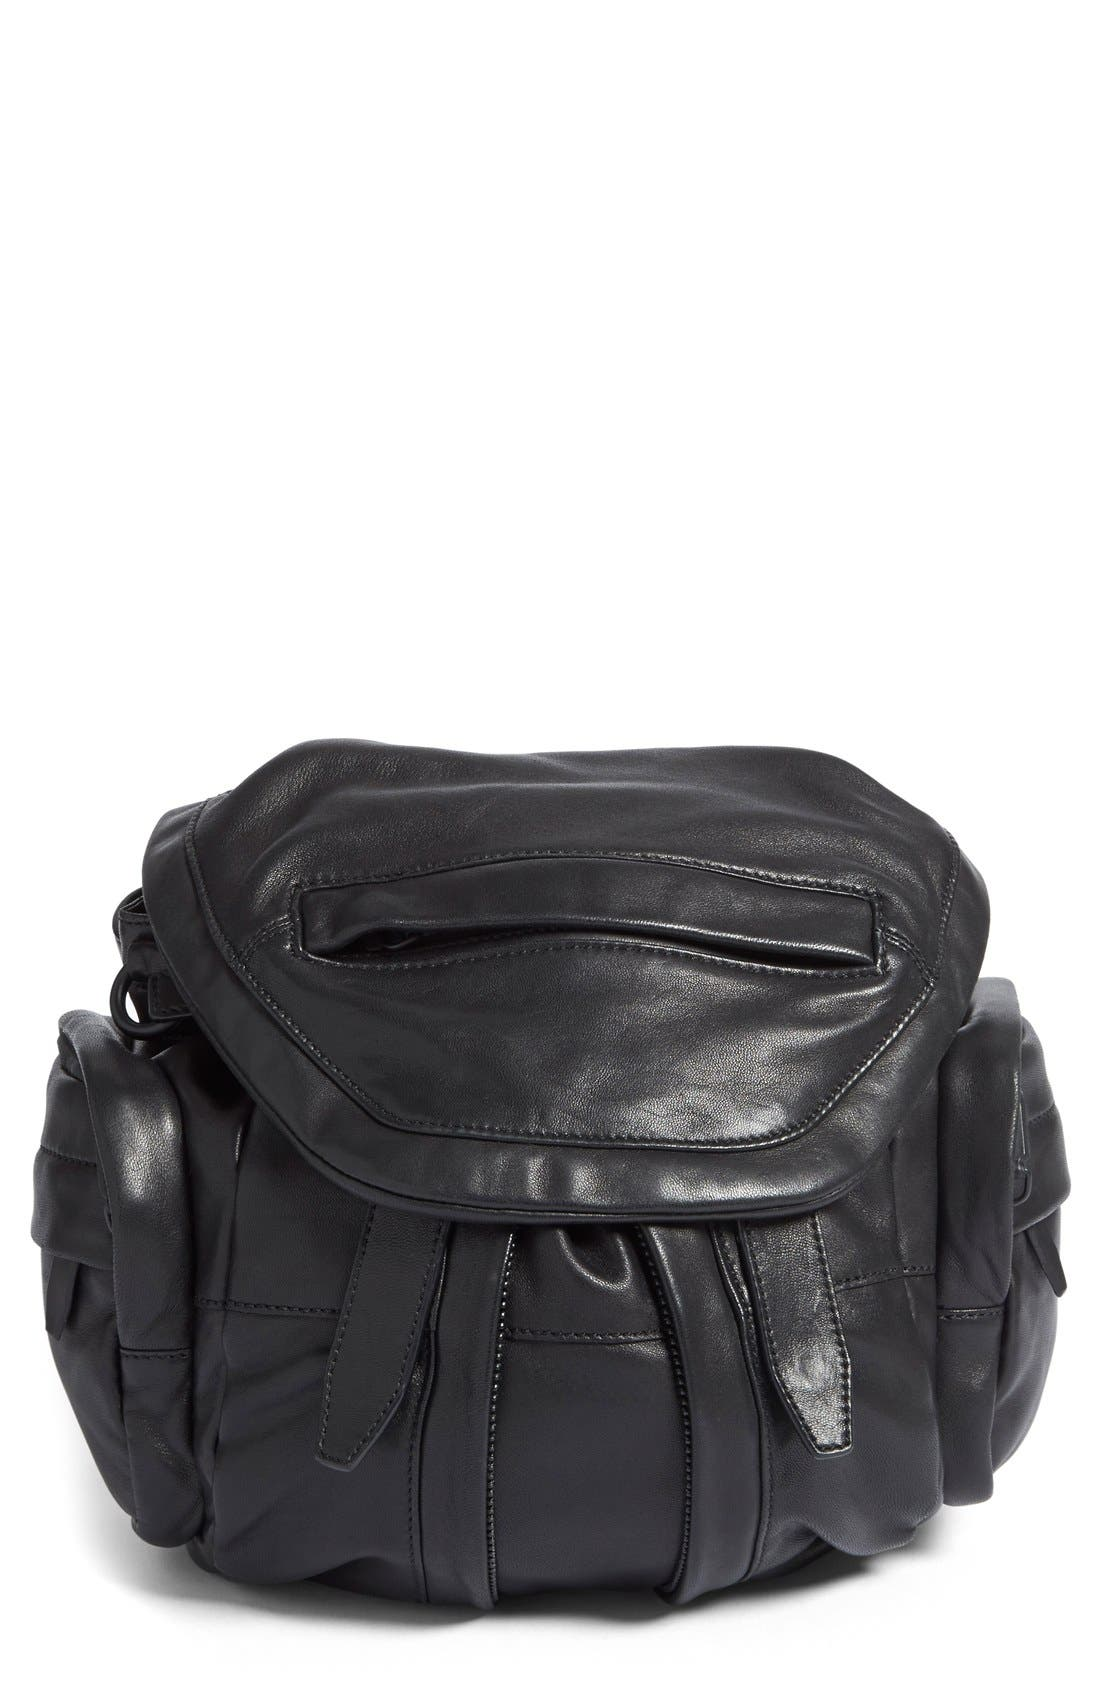 Alternate Image 1 Selected - Alexander Wang Mini Marti Leather Backpack